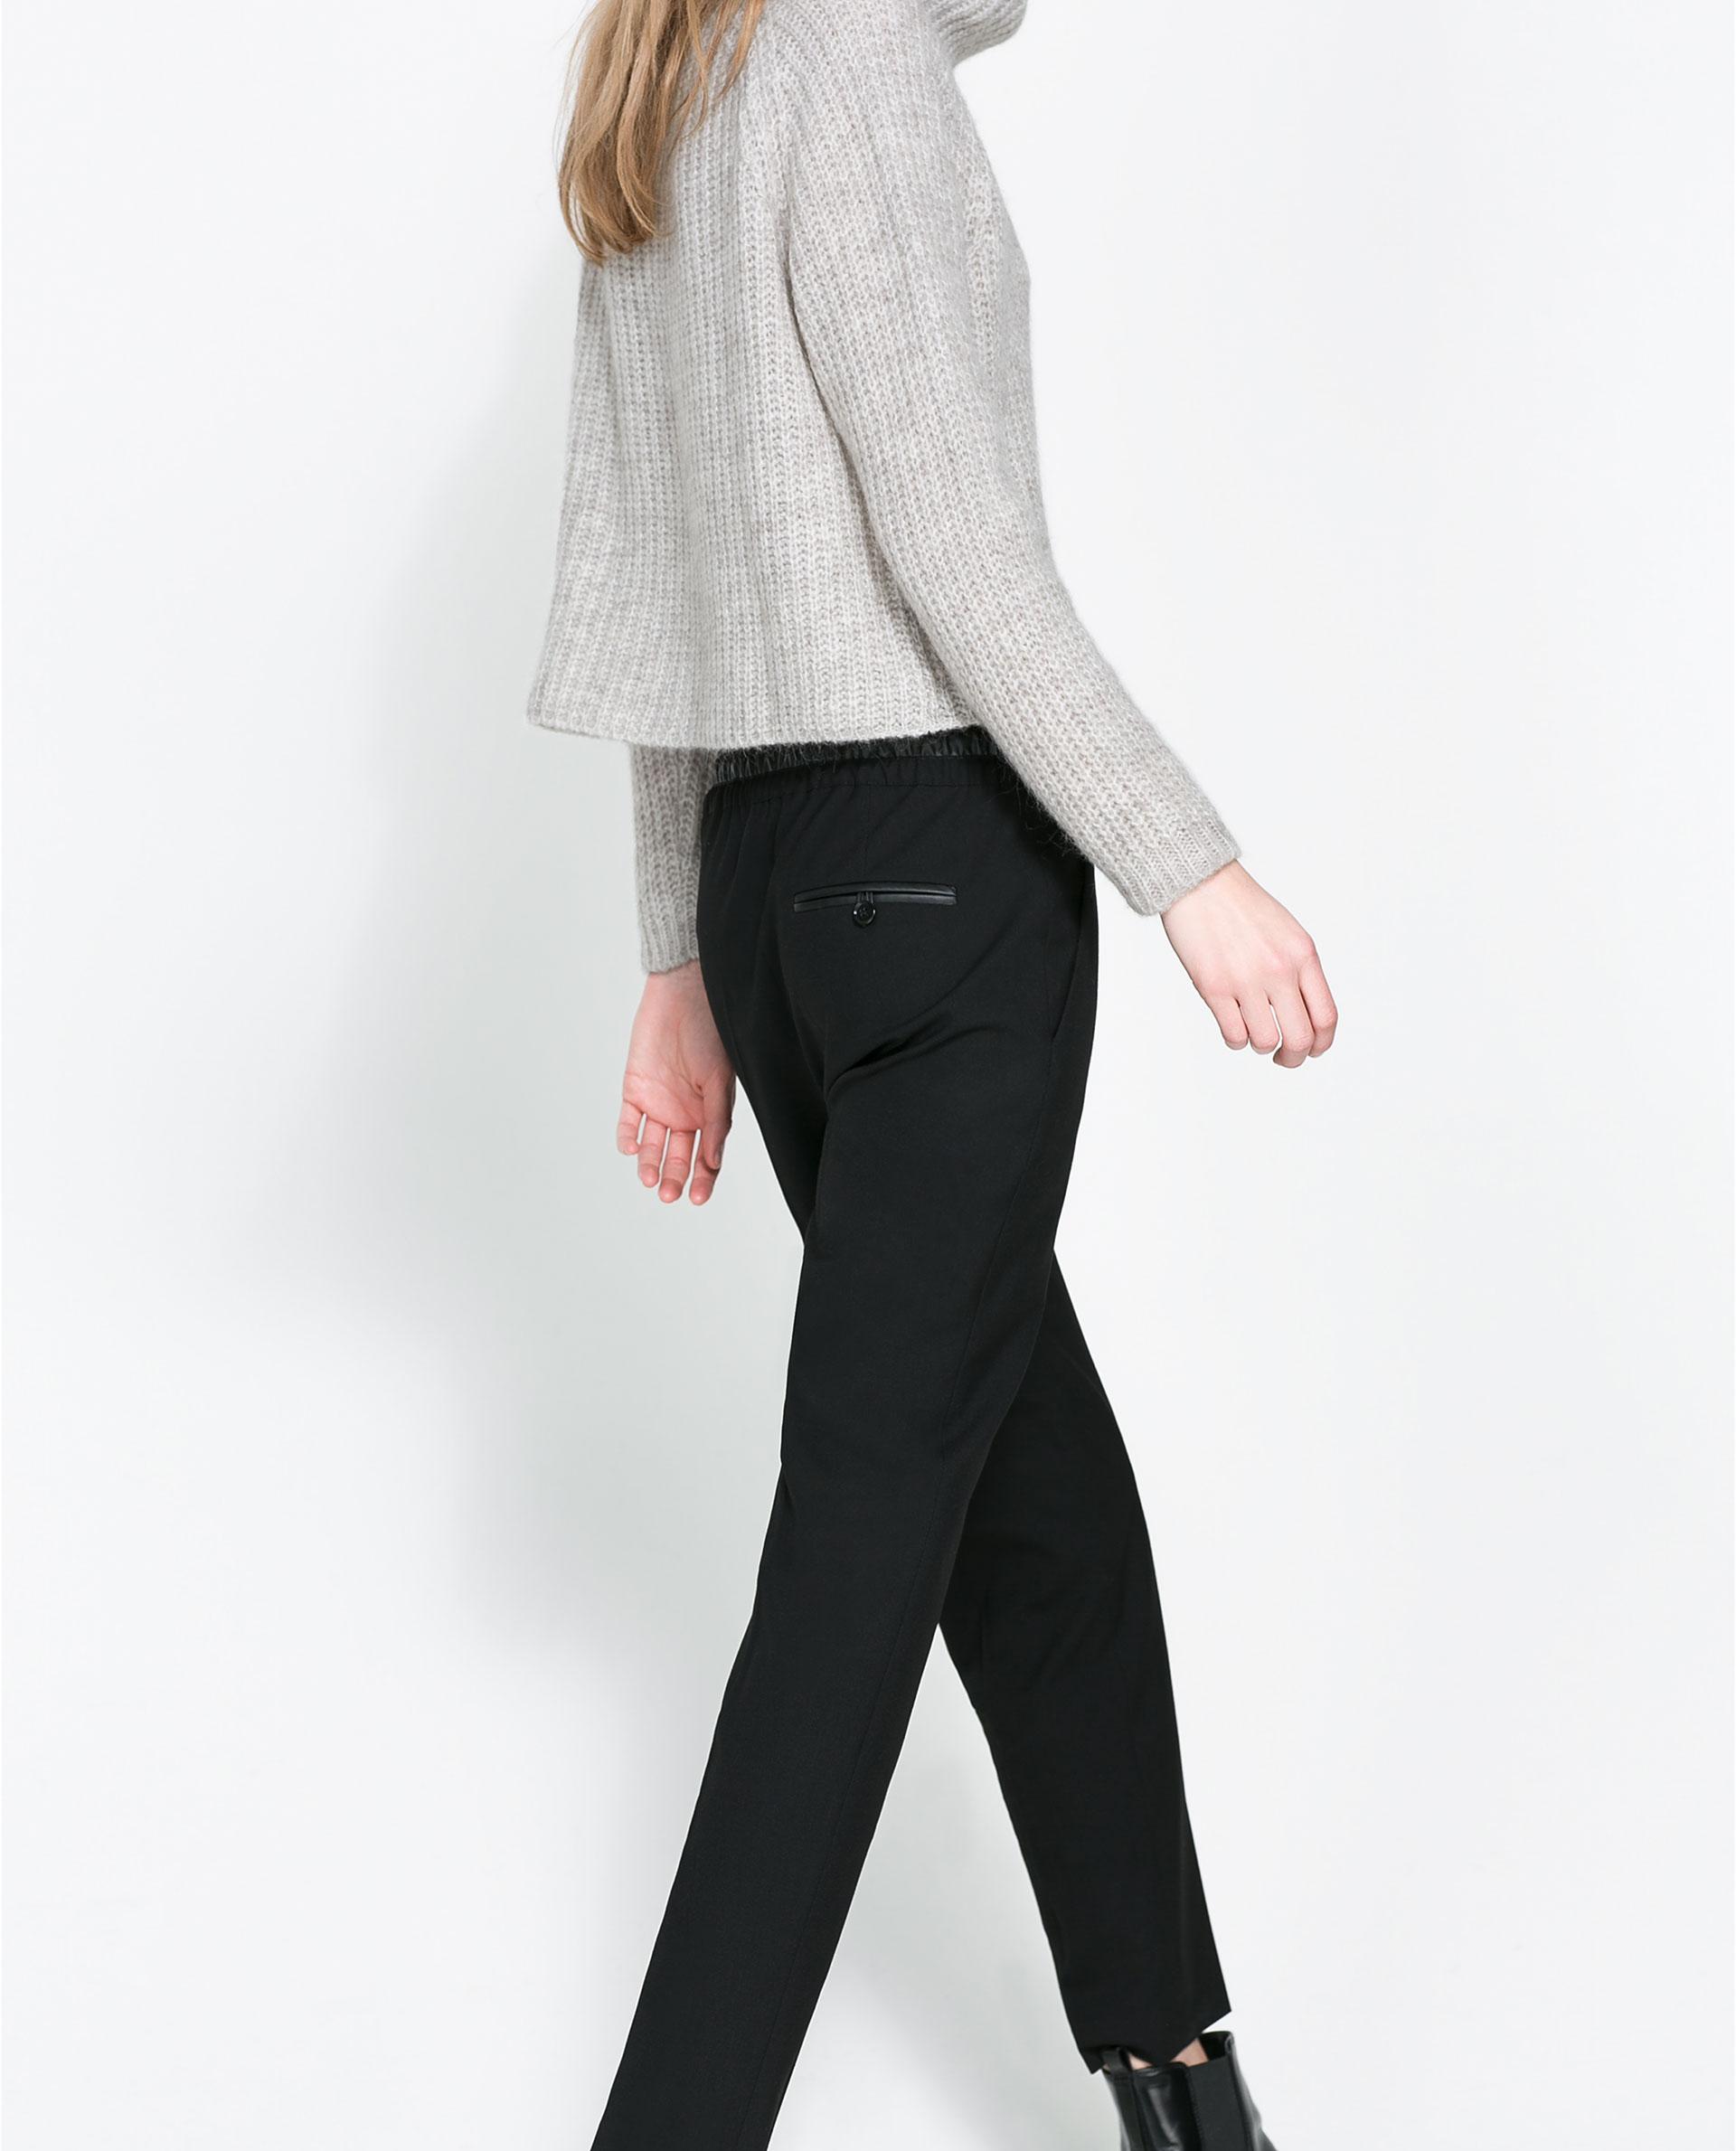 Simple ZARA Woman BNWT Authentic Faux Leather Biker Trousers Pants Zips M L